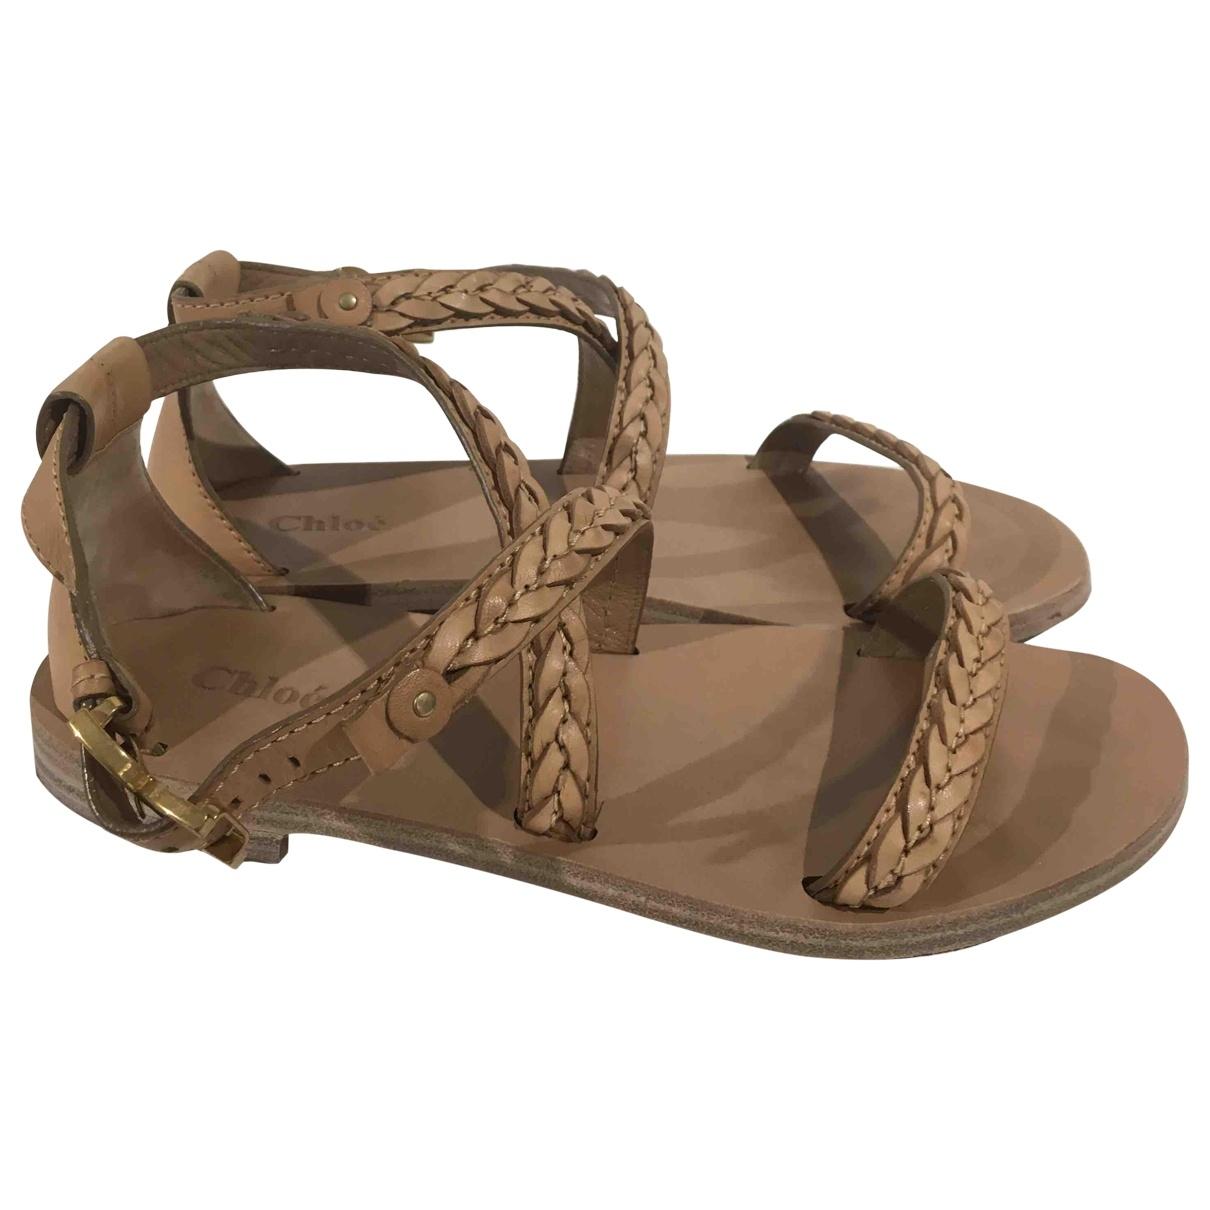 Chloé \N Leather Sandals for Women 38.5 EU